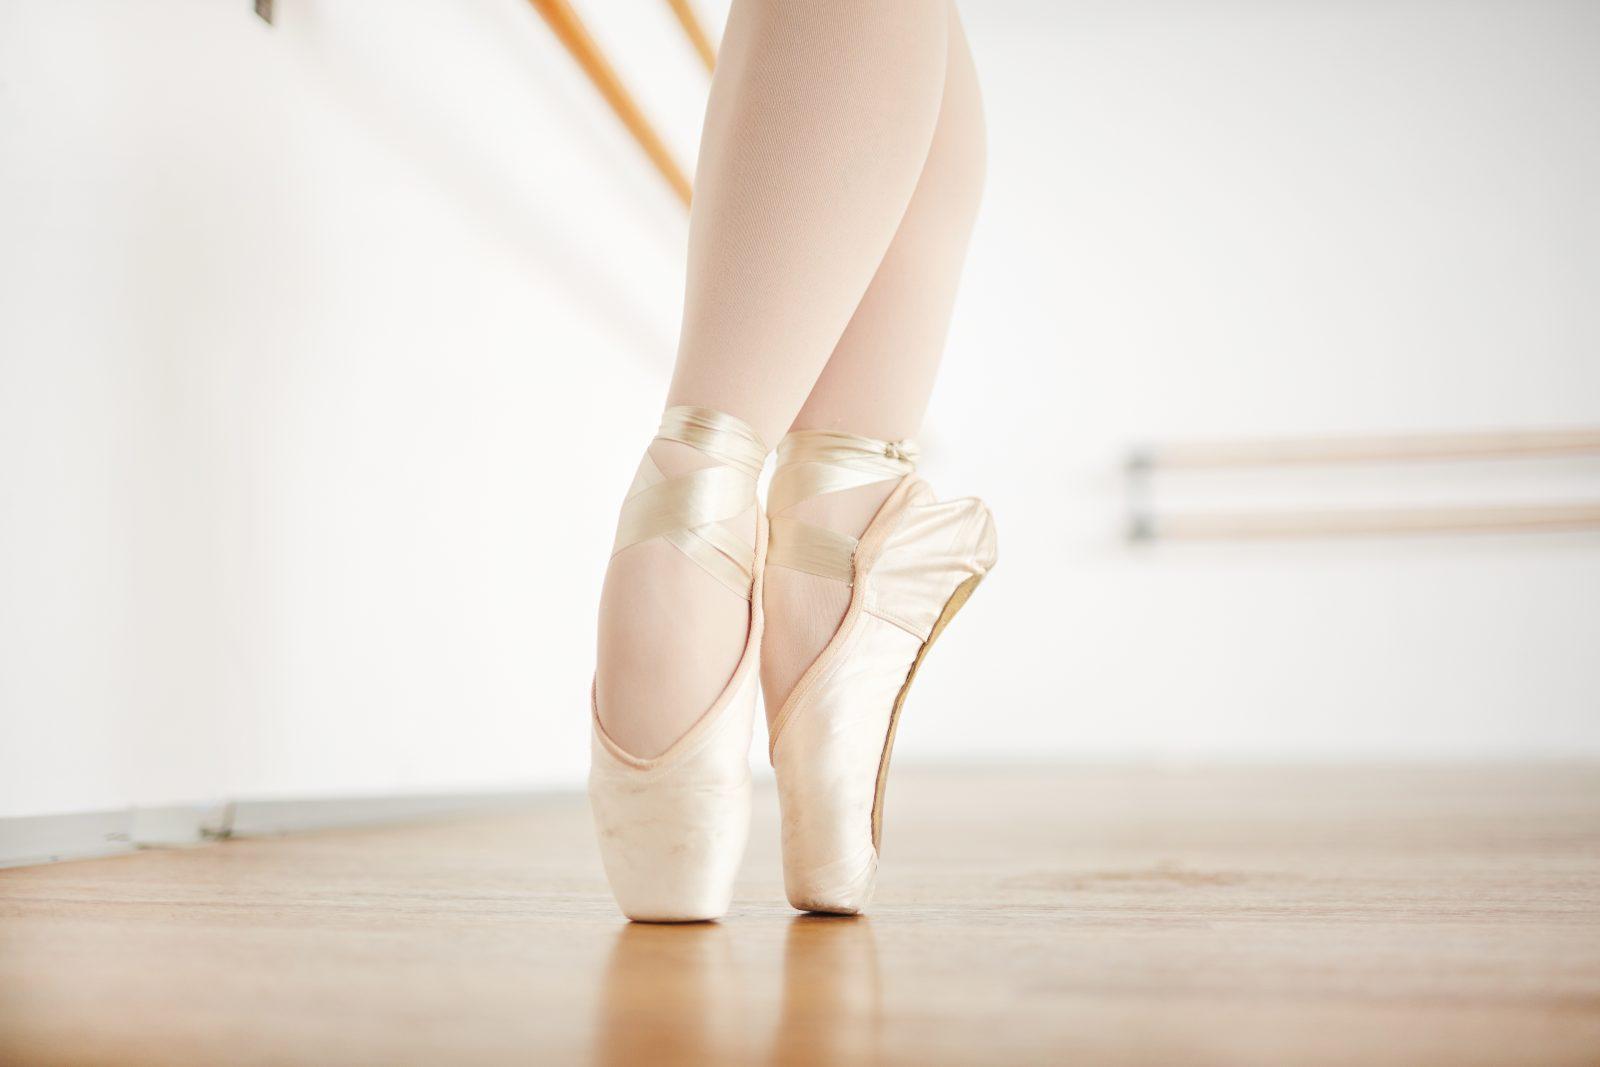 cc7aca4ea8 Arquivos ballet adulto - Ana Botafogo Maison